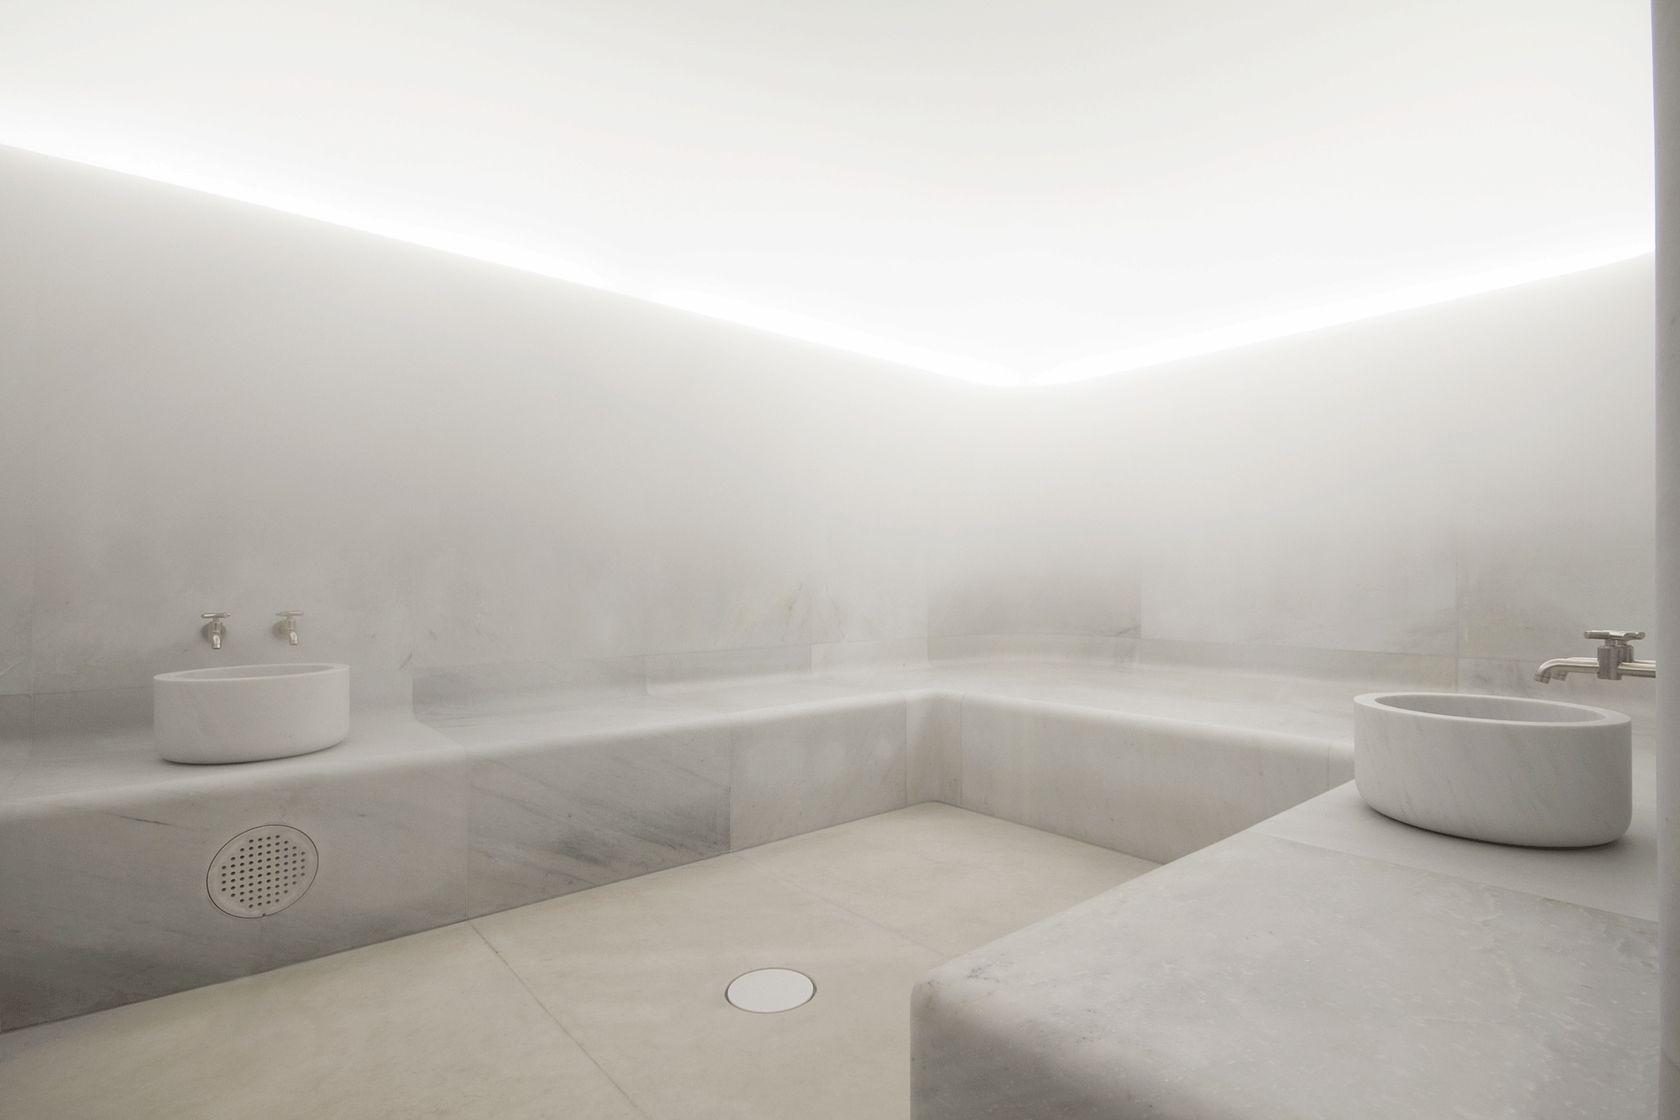 Carrara marble bathroom image the cafe royal hotel regent street - Custom Made Sauna For Caf Royal London Designed By David Chipperfield Architects Realized By 4seasonsspa Www 4seasonsspa Pro Com Pinterest